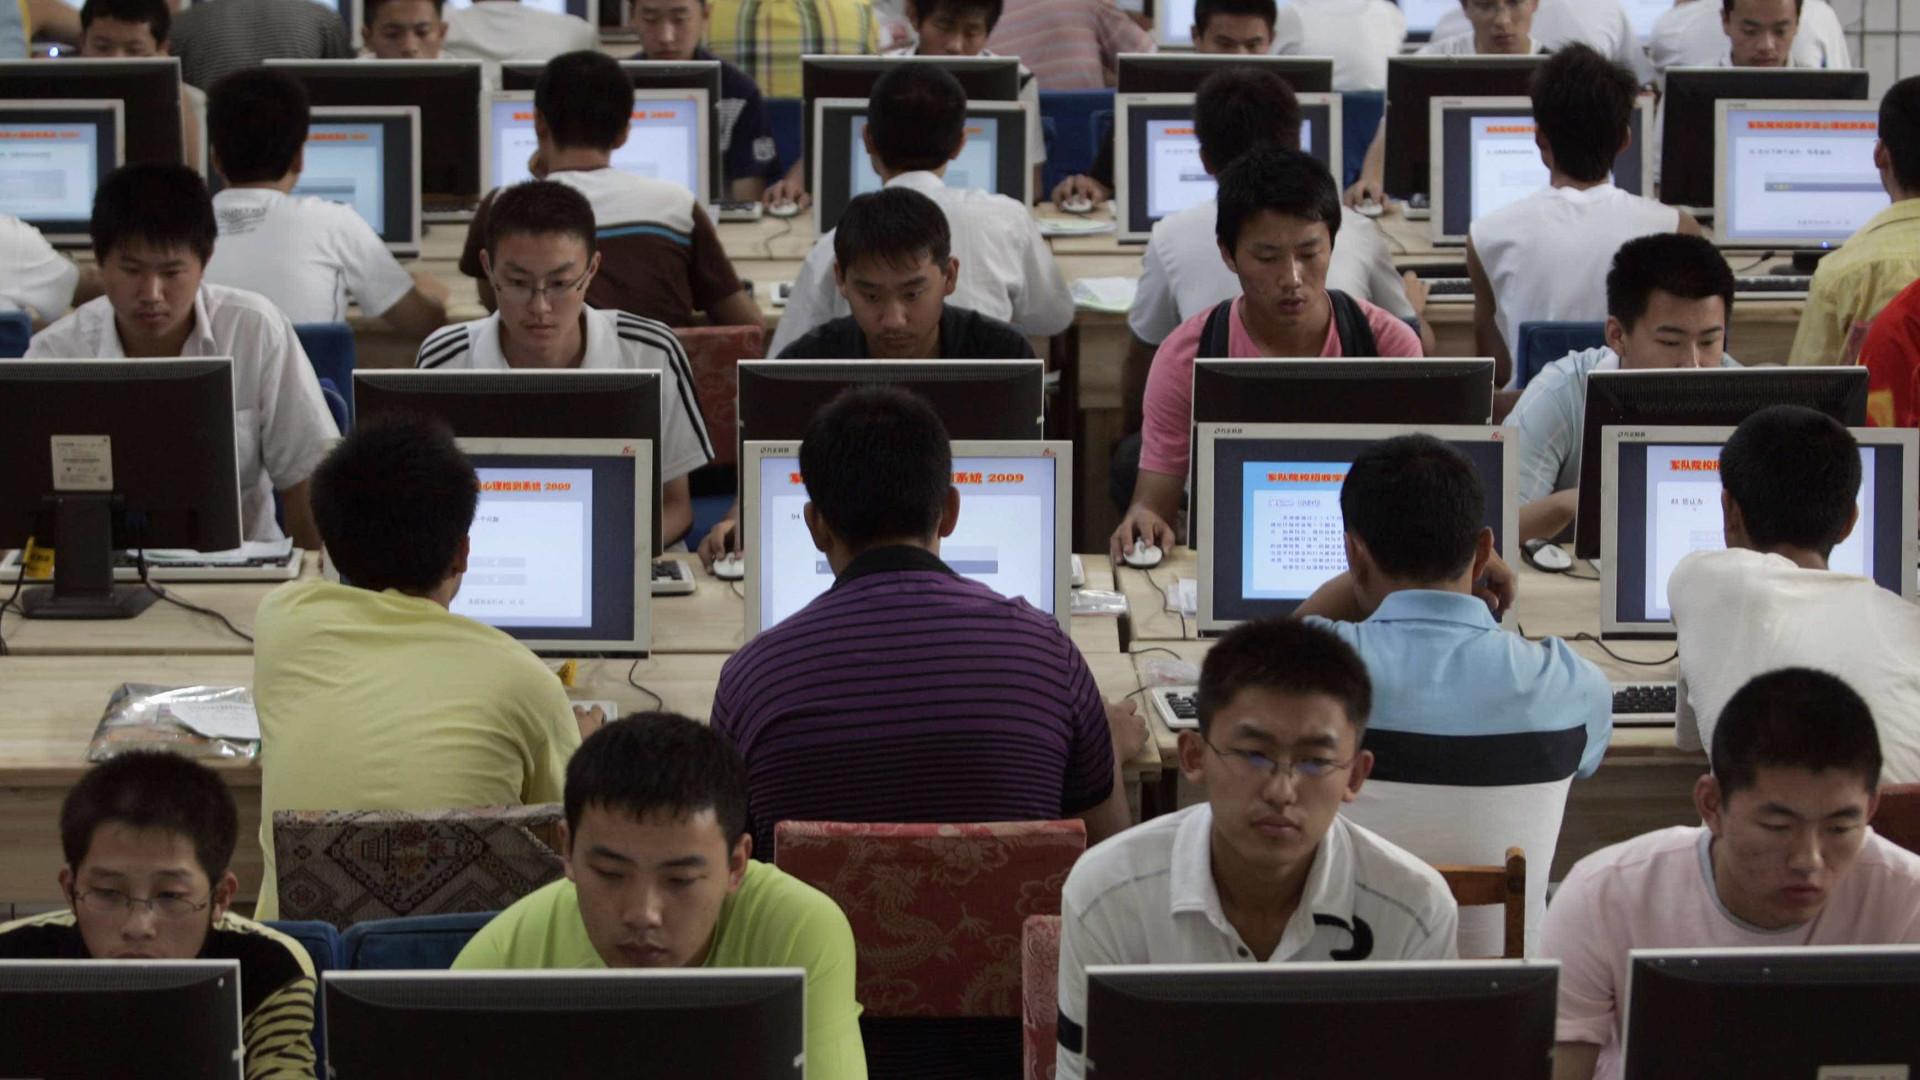 Portal do jornal espanhol El País volta a estar acessível na China